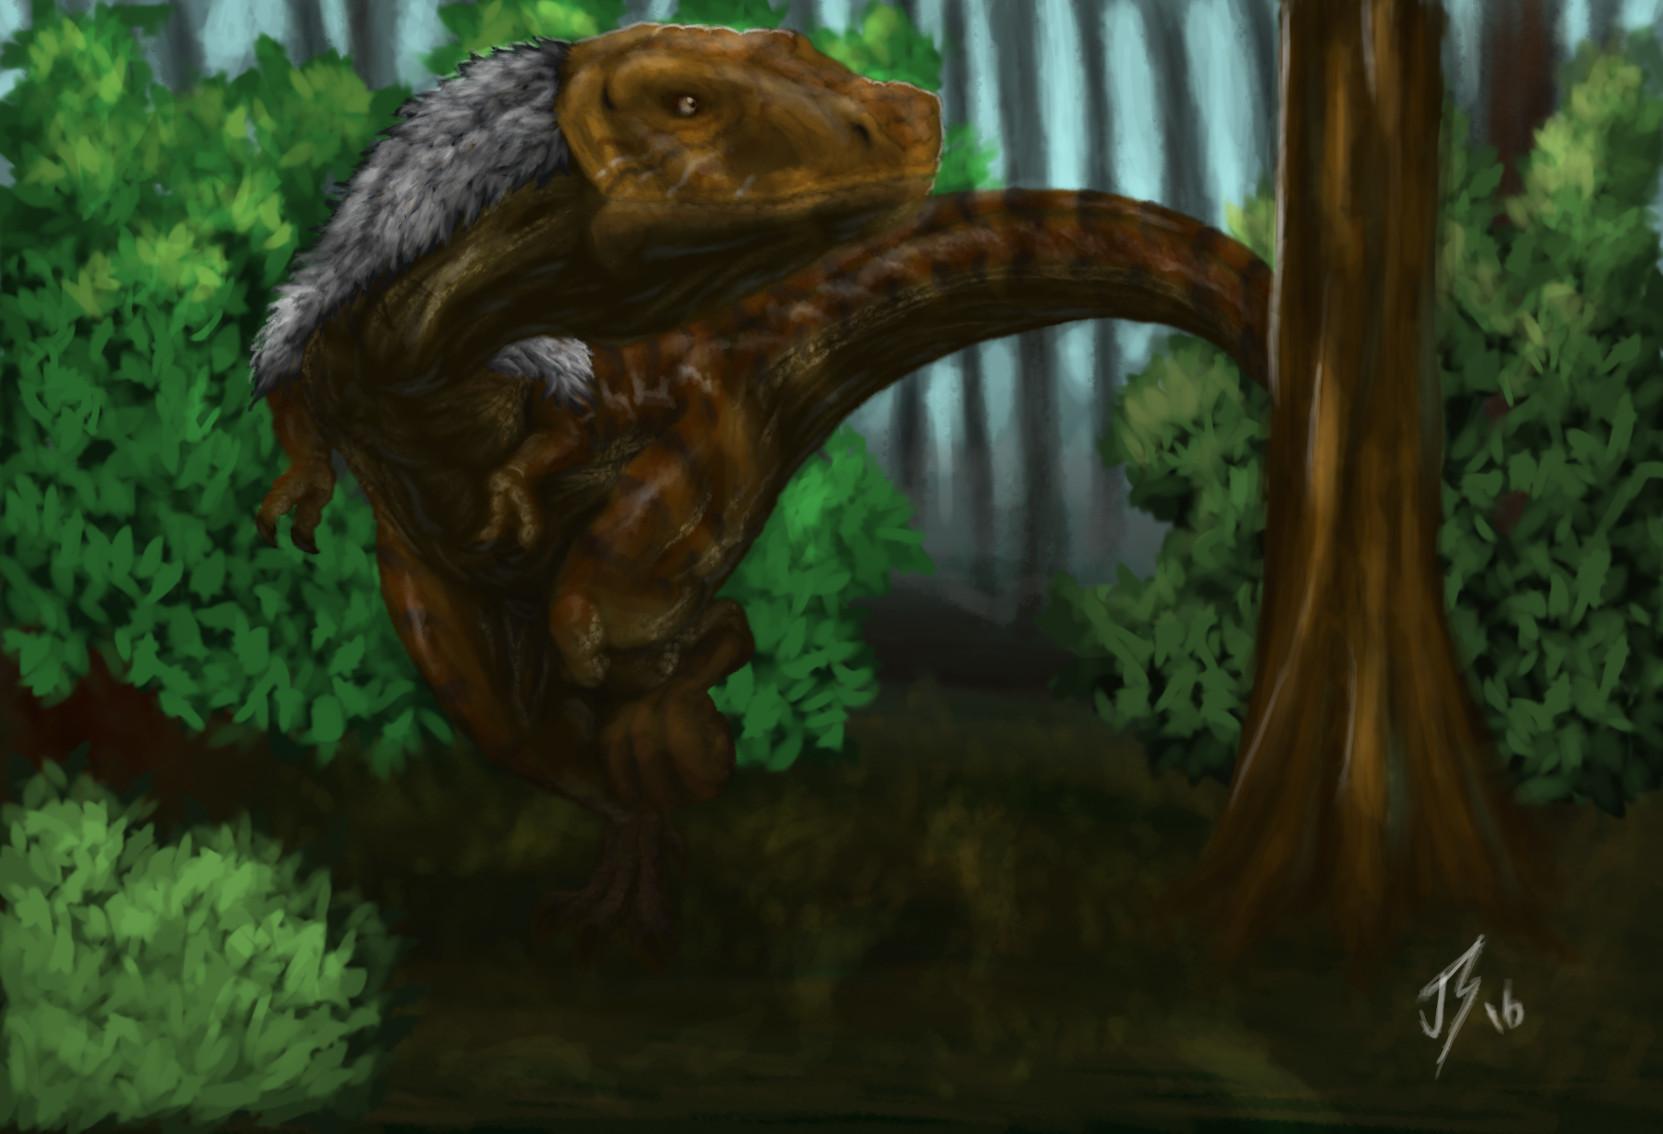 Joey shifflett tyrannosaurusfinal